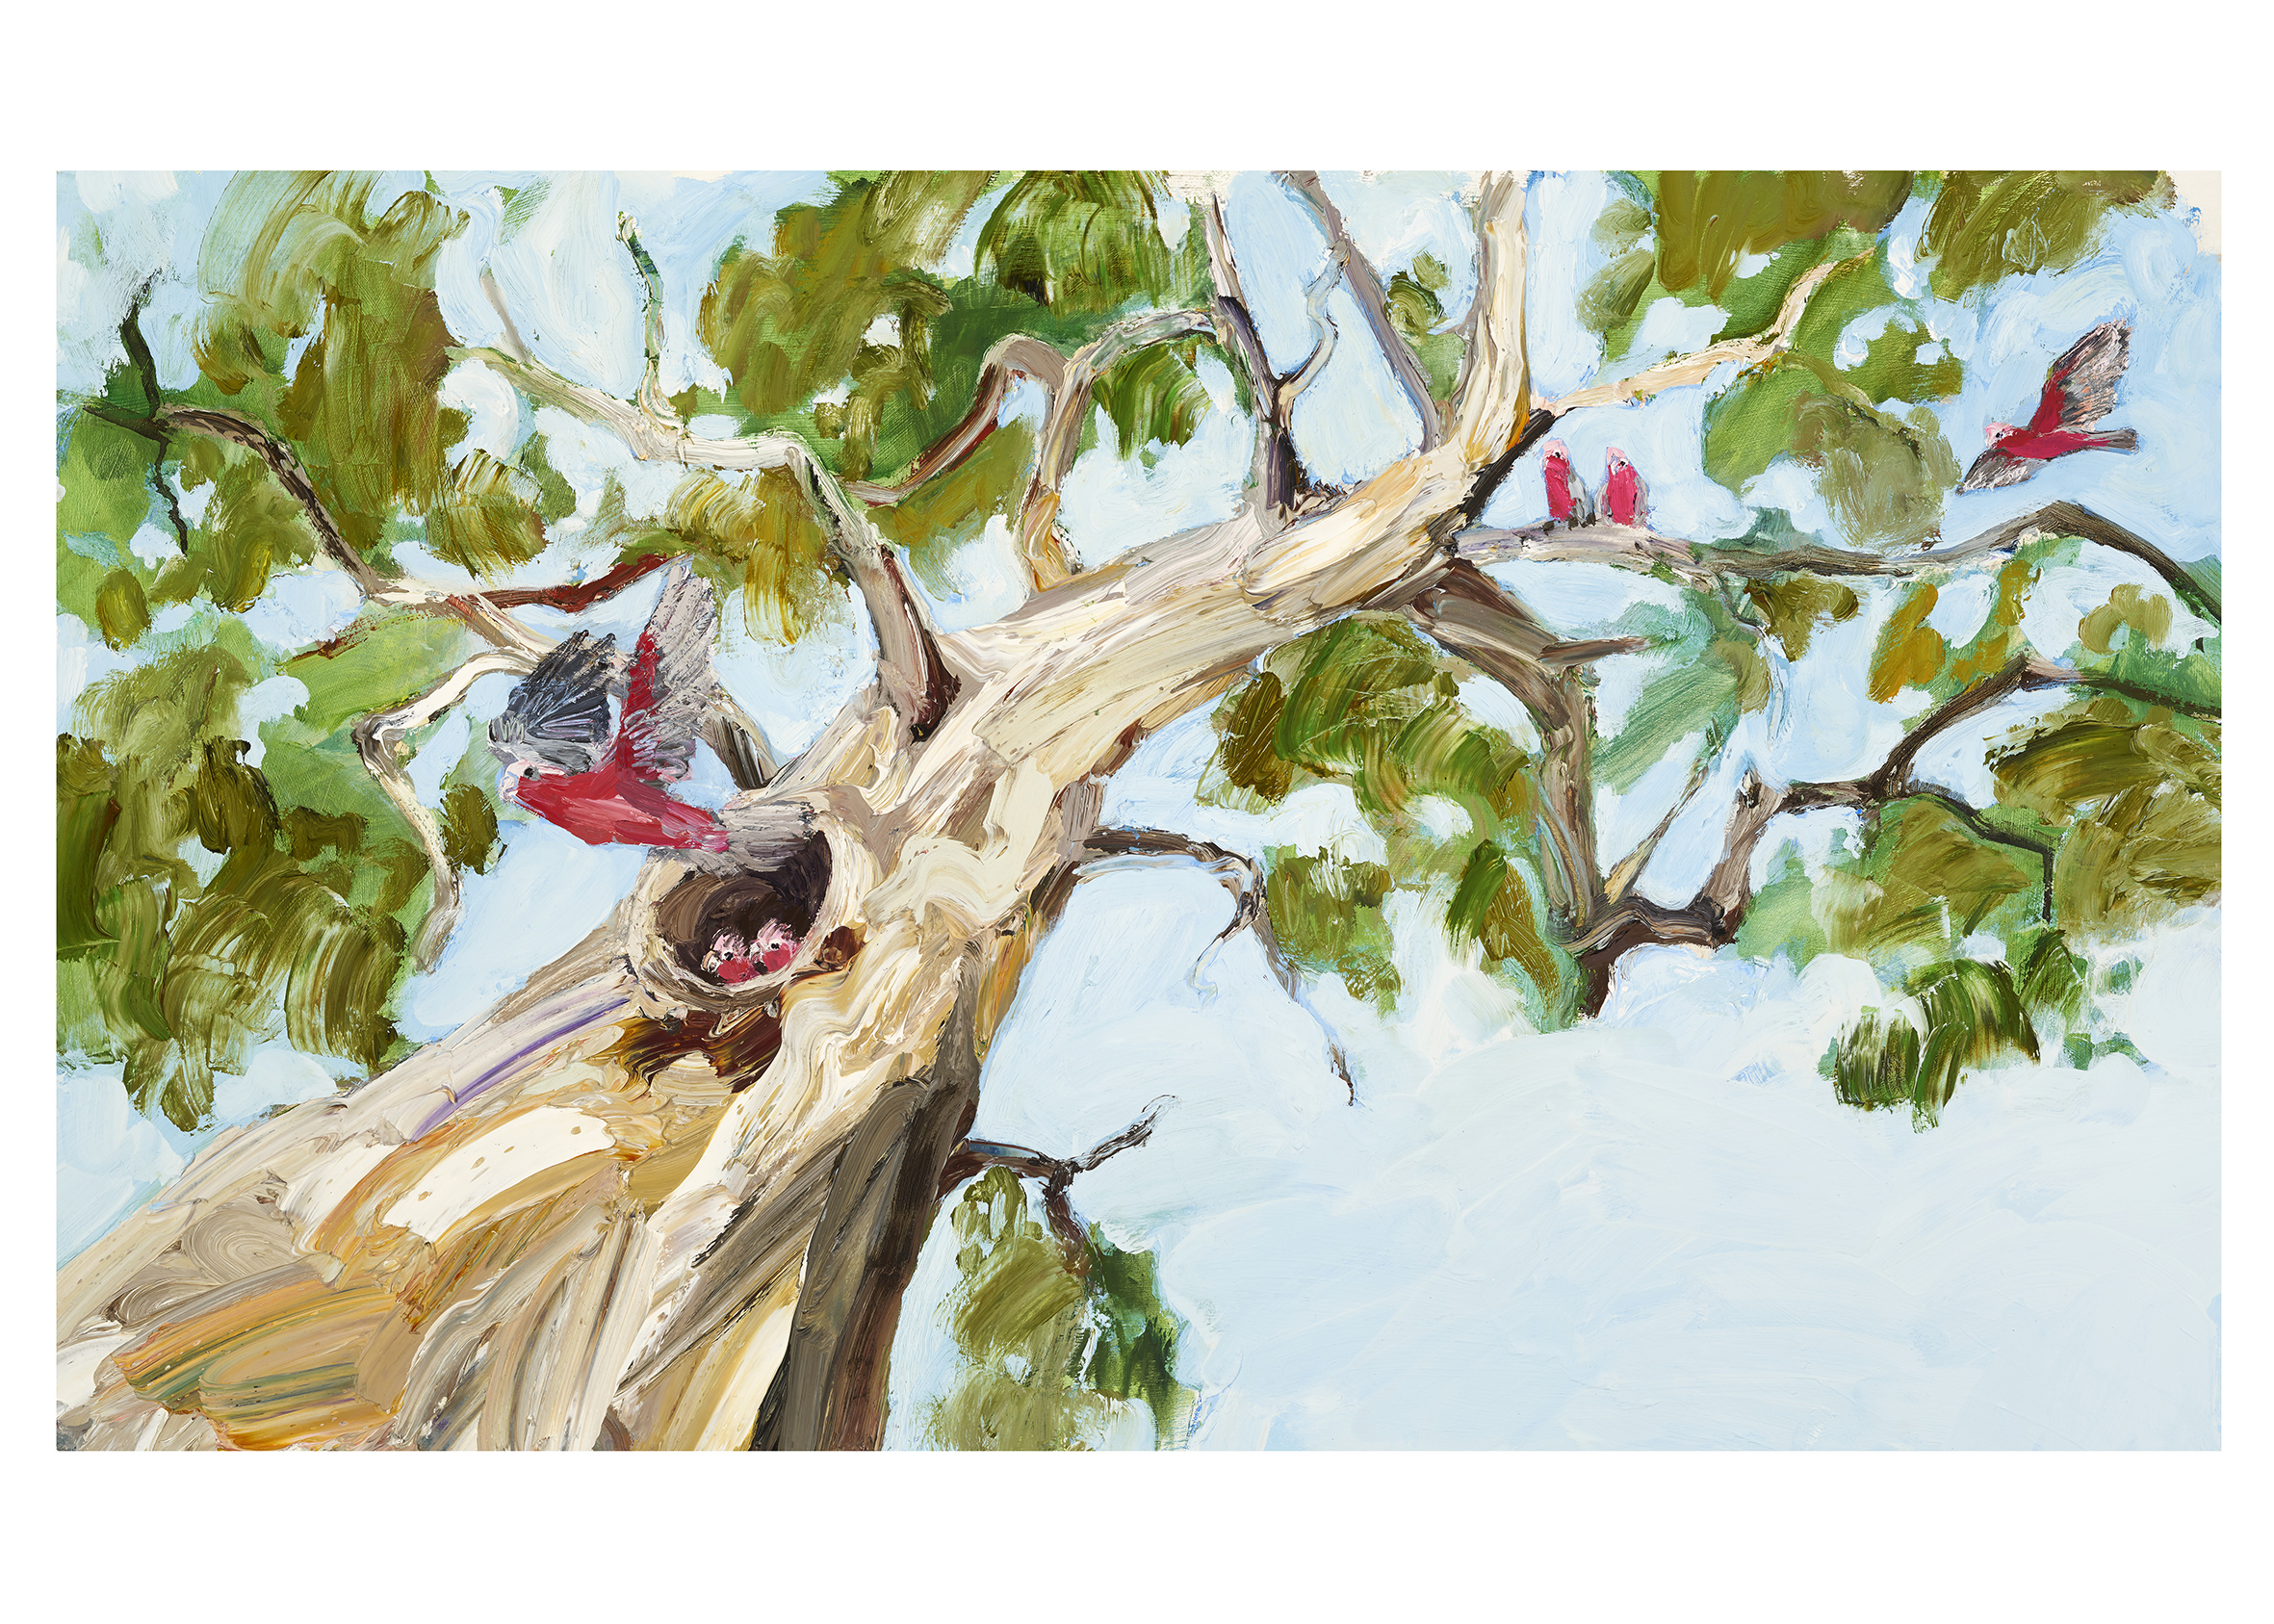 Illustration from Mallee Sky by Jodi Toering/Tannya Harricks